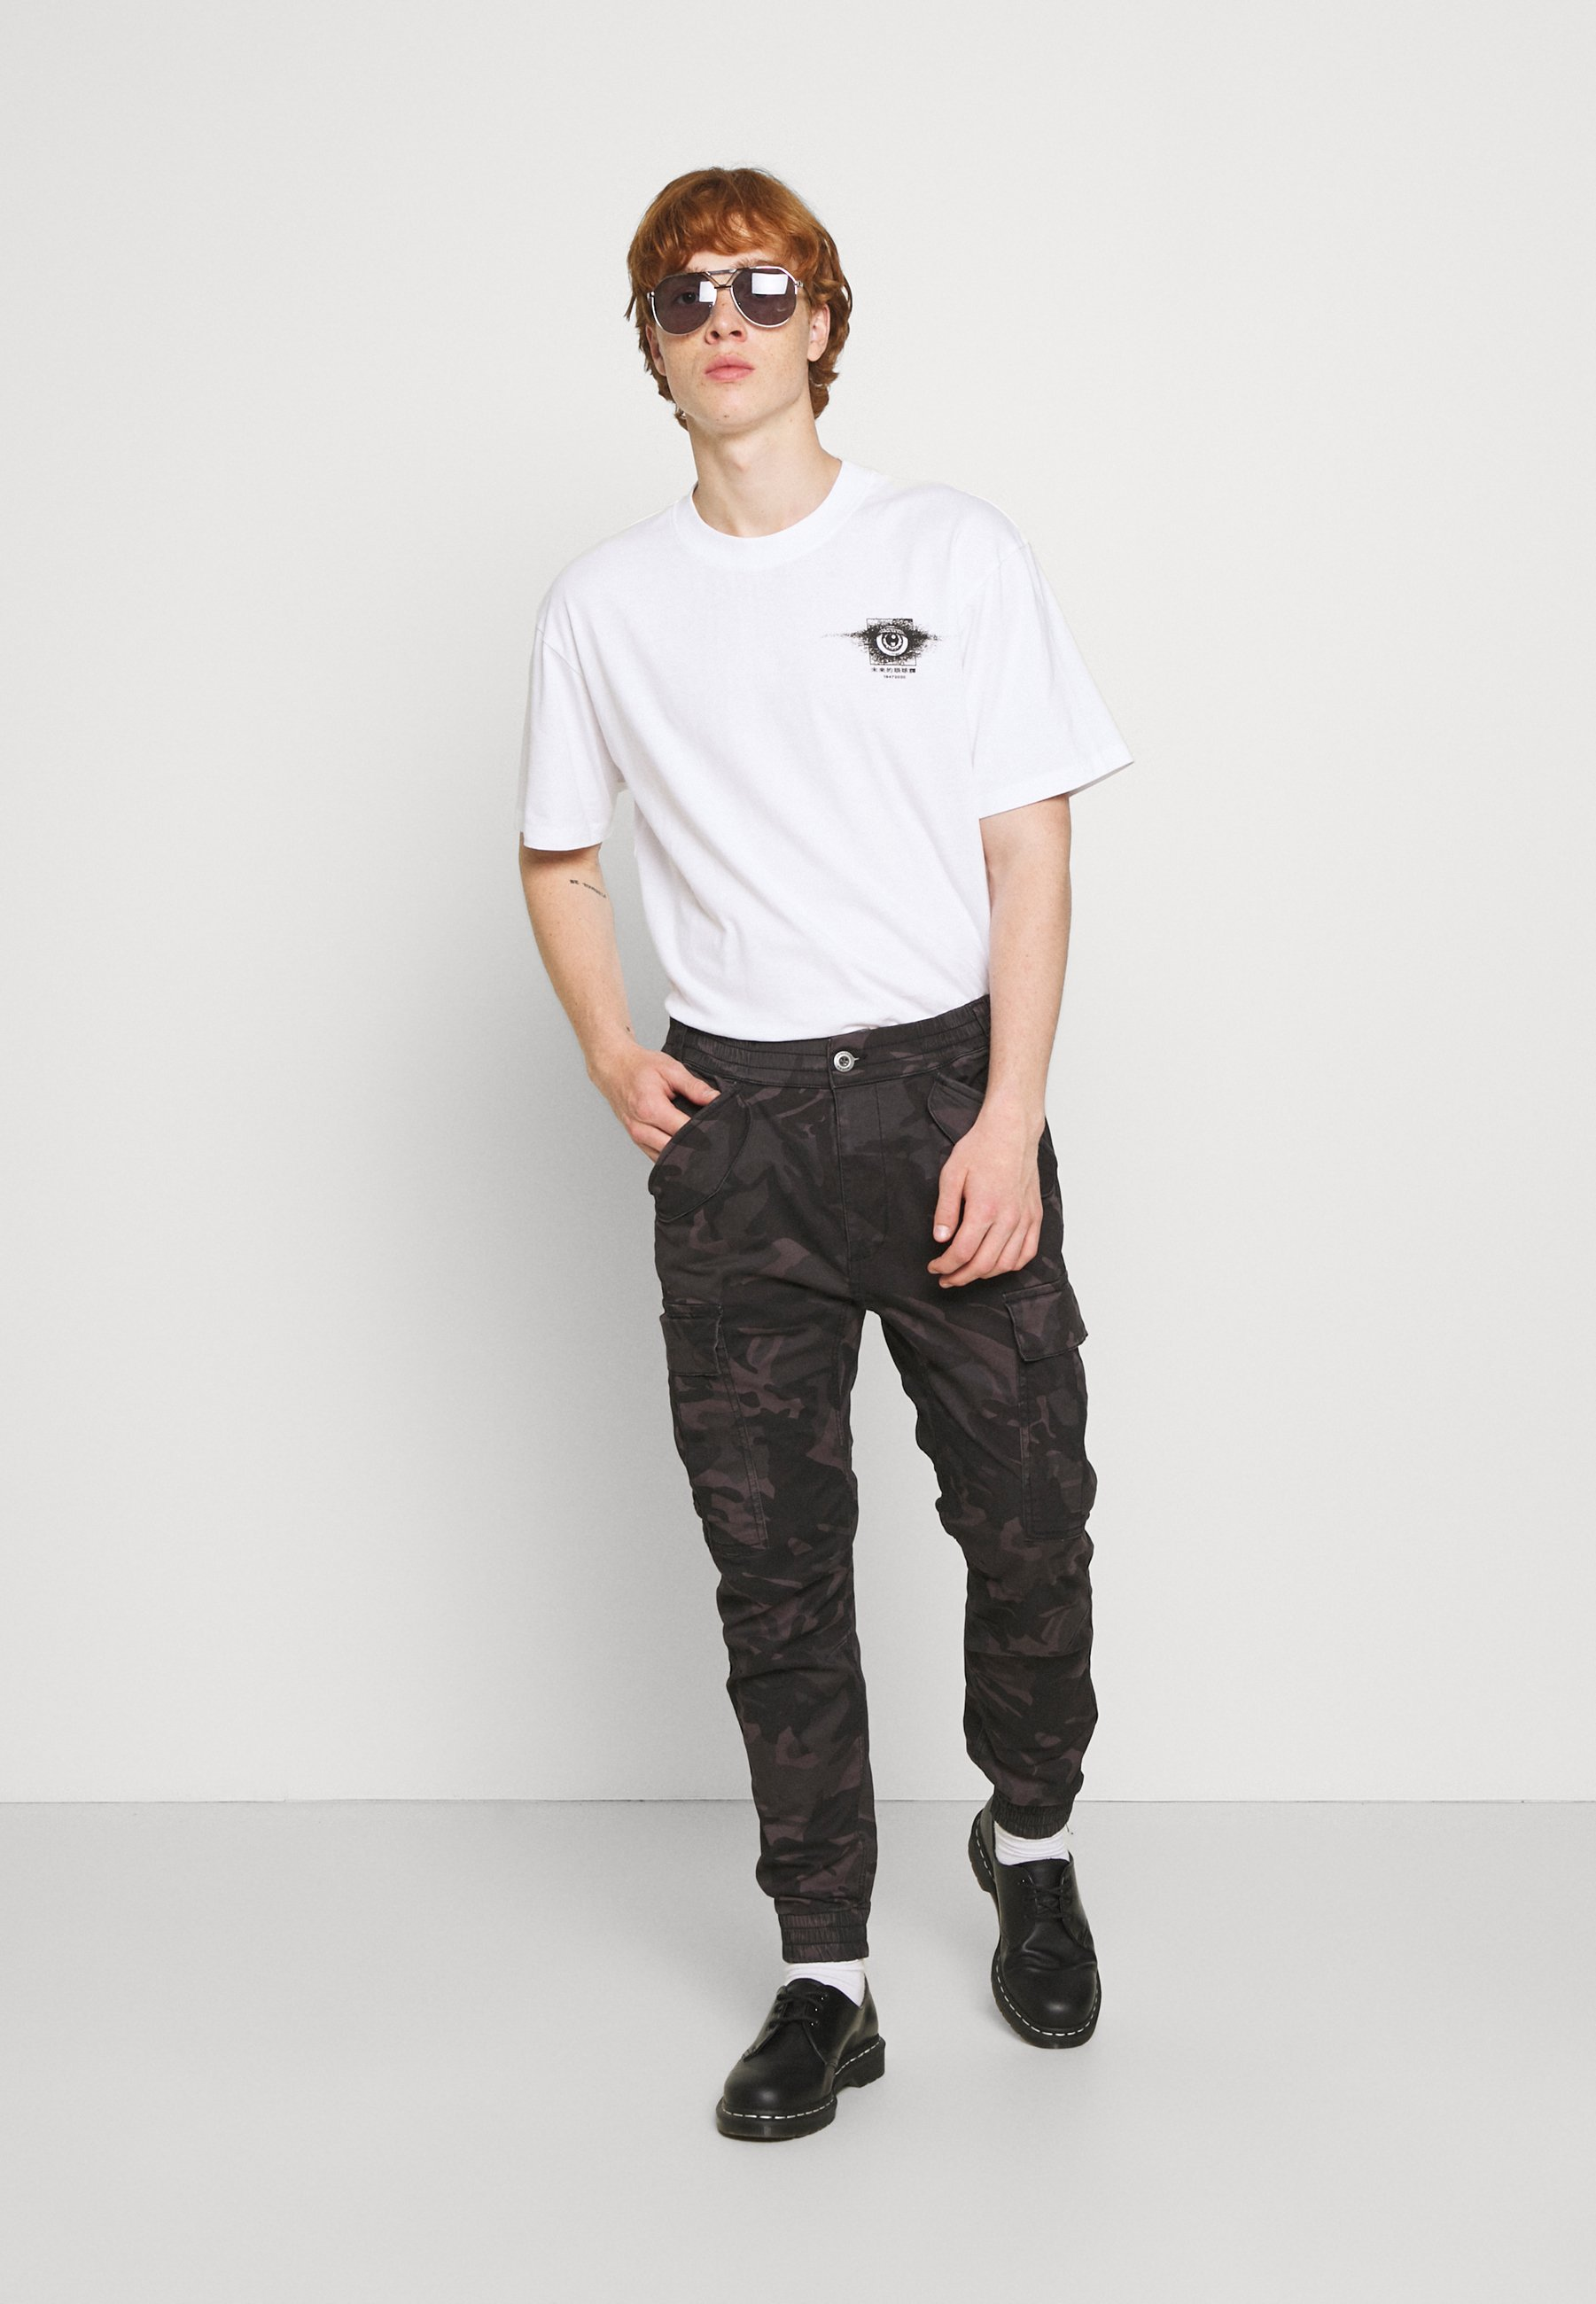 Homme AIRMAN - Pantalon cargo - black